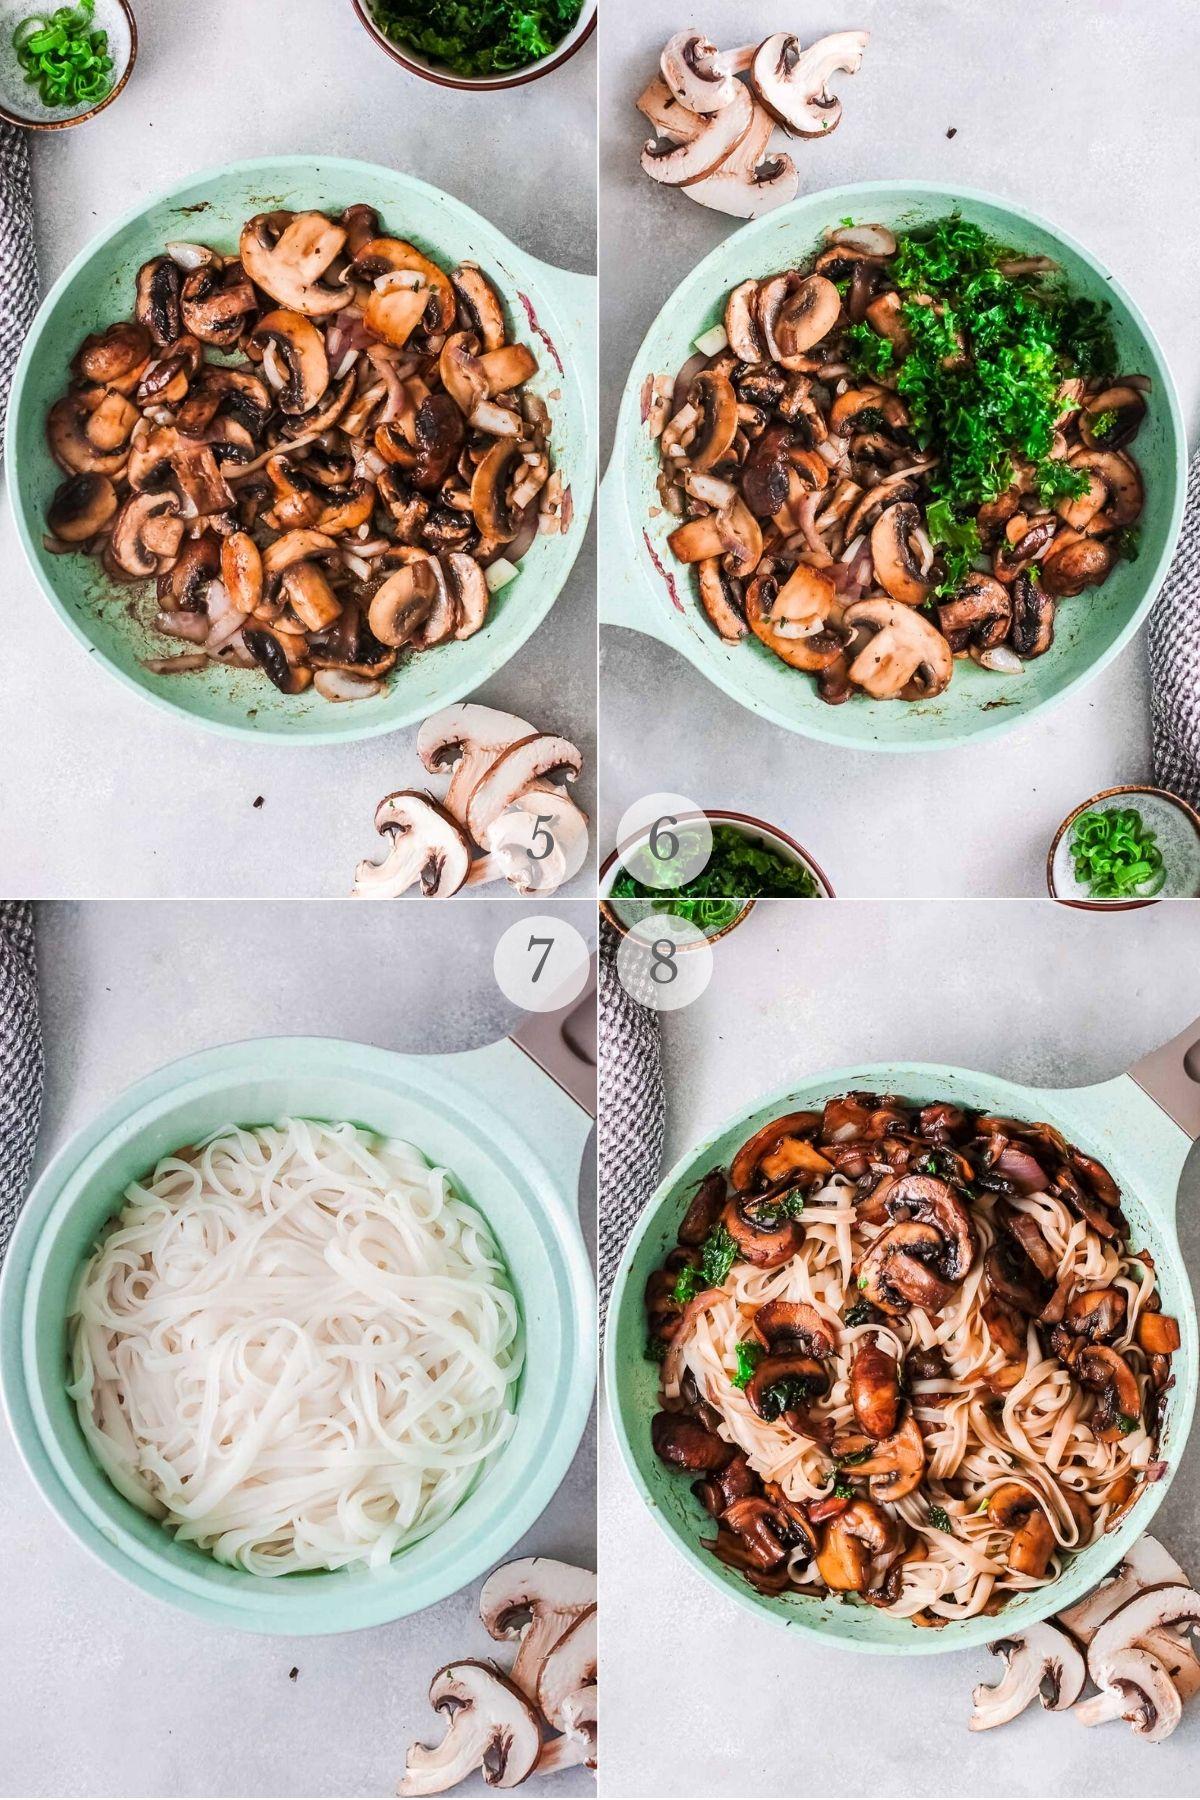 Korean Noodles recipe steps 5-8